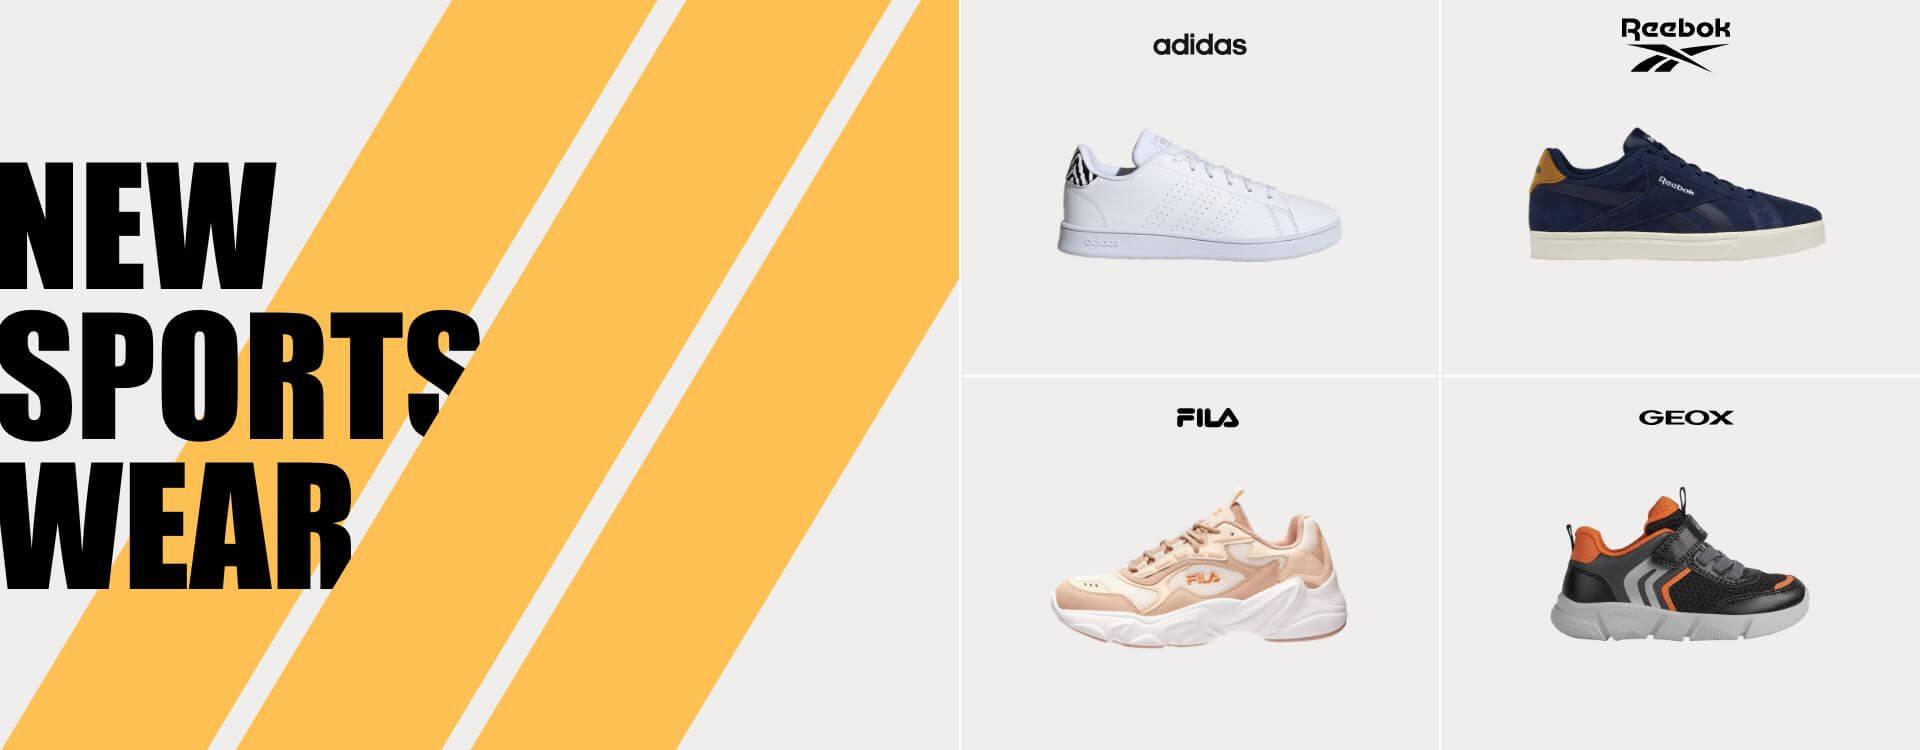 Grandes Marcas | Adidas | Reebok | Geox | Fila